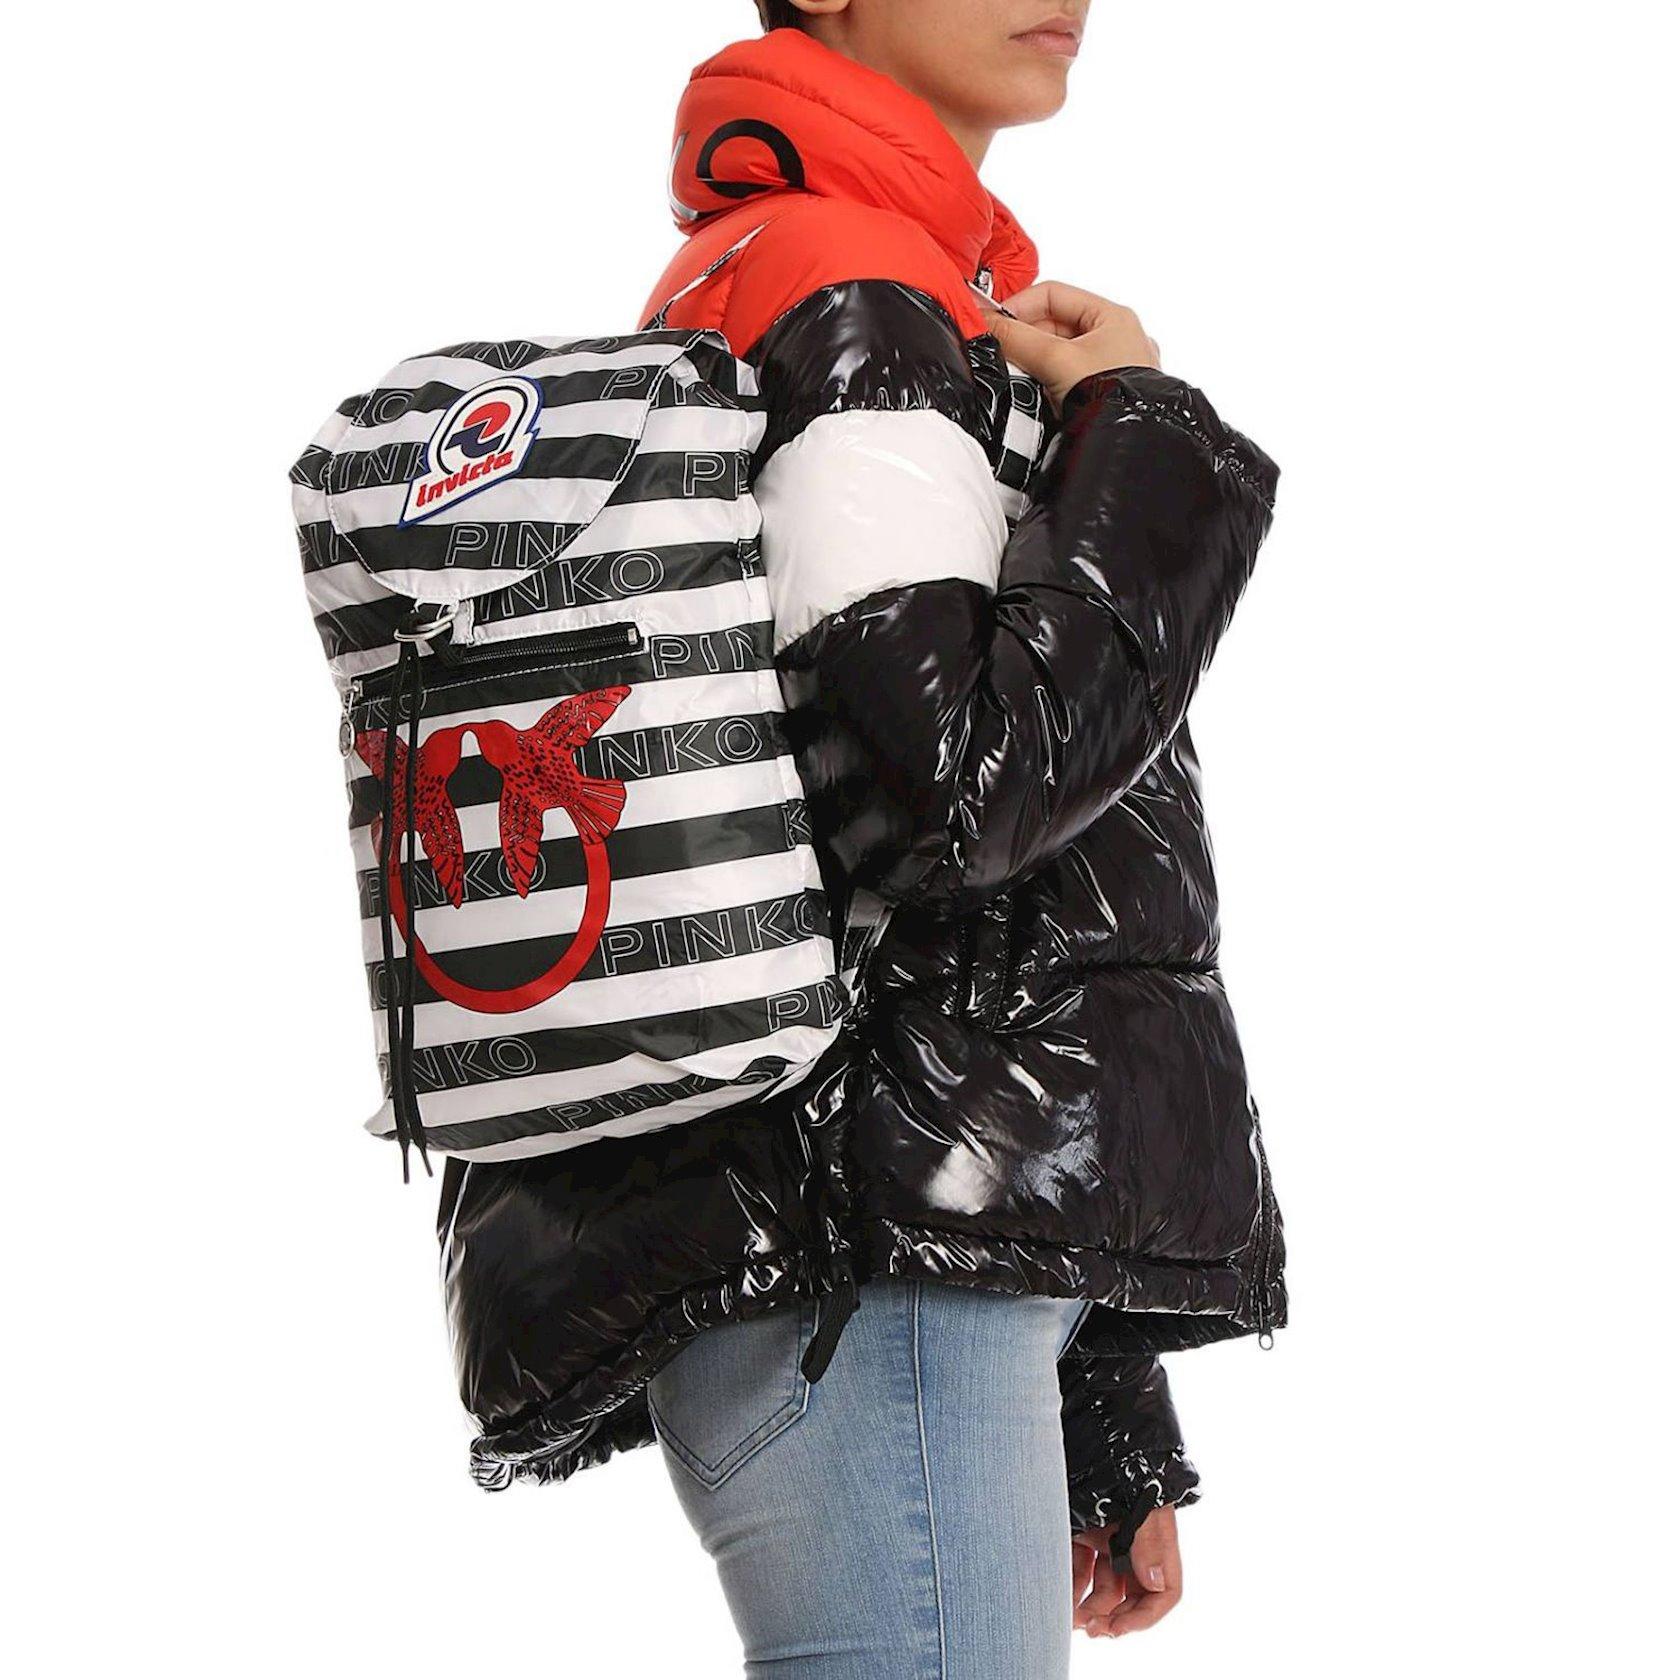 Bel çantası Pinko 1I2001-Y4TA Mini Sac In Love, parça, 25x38x9sm, Ağ